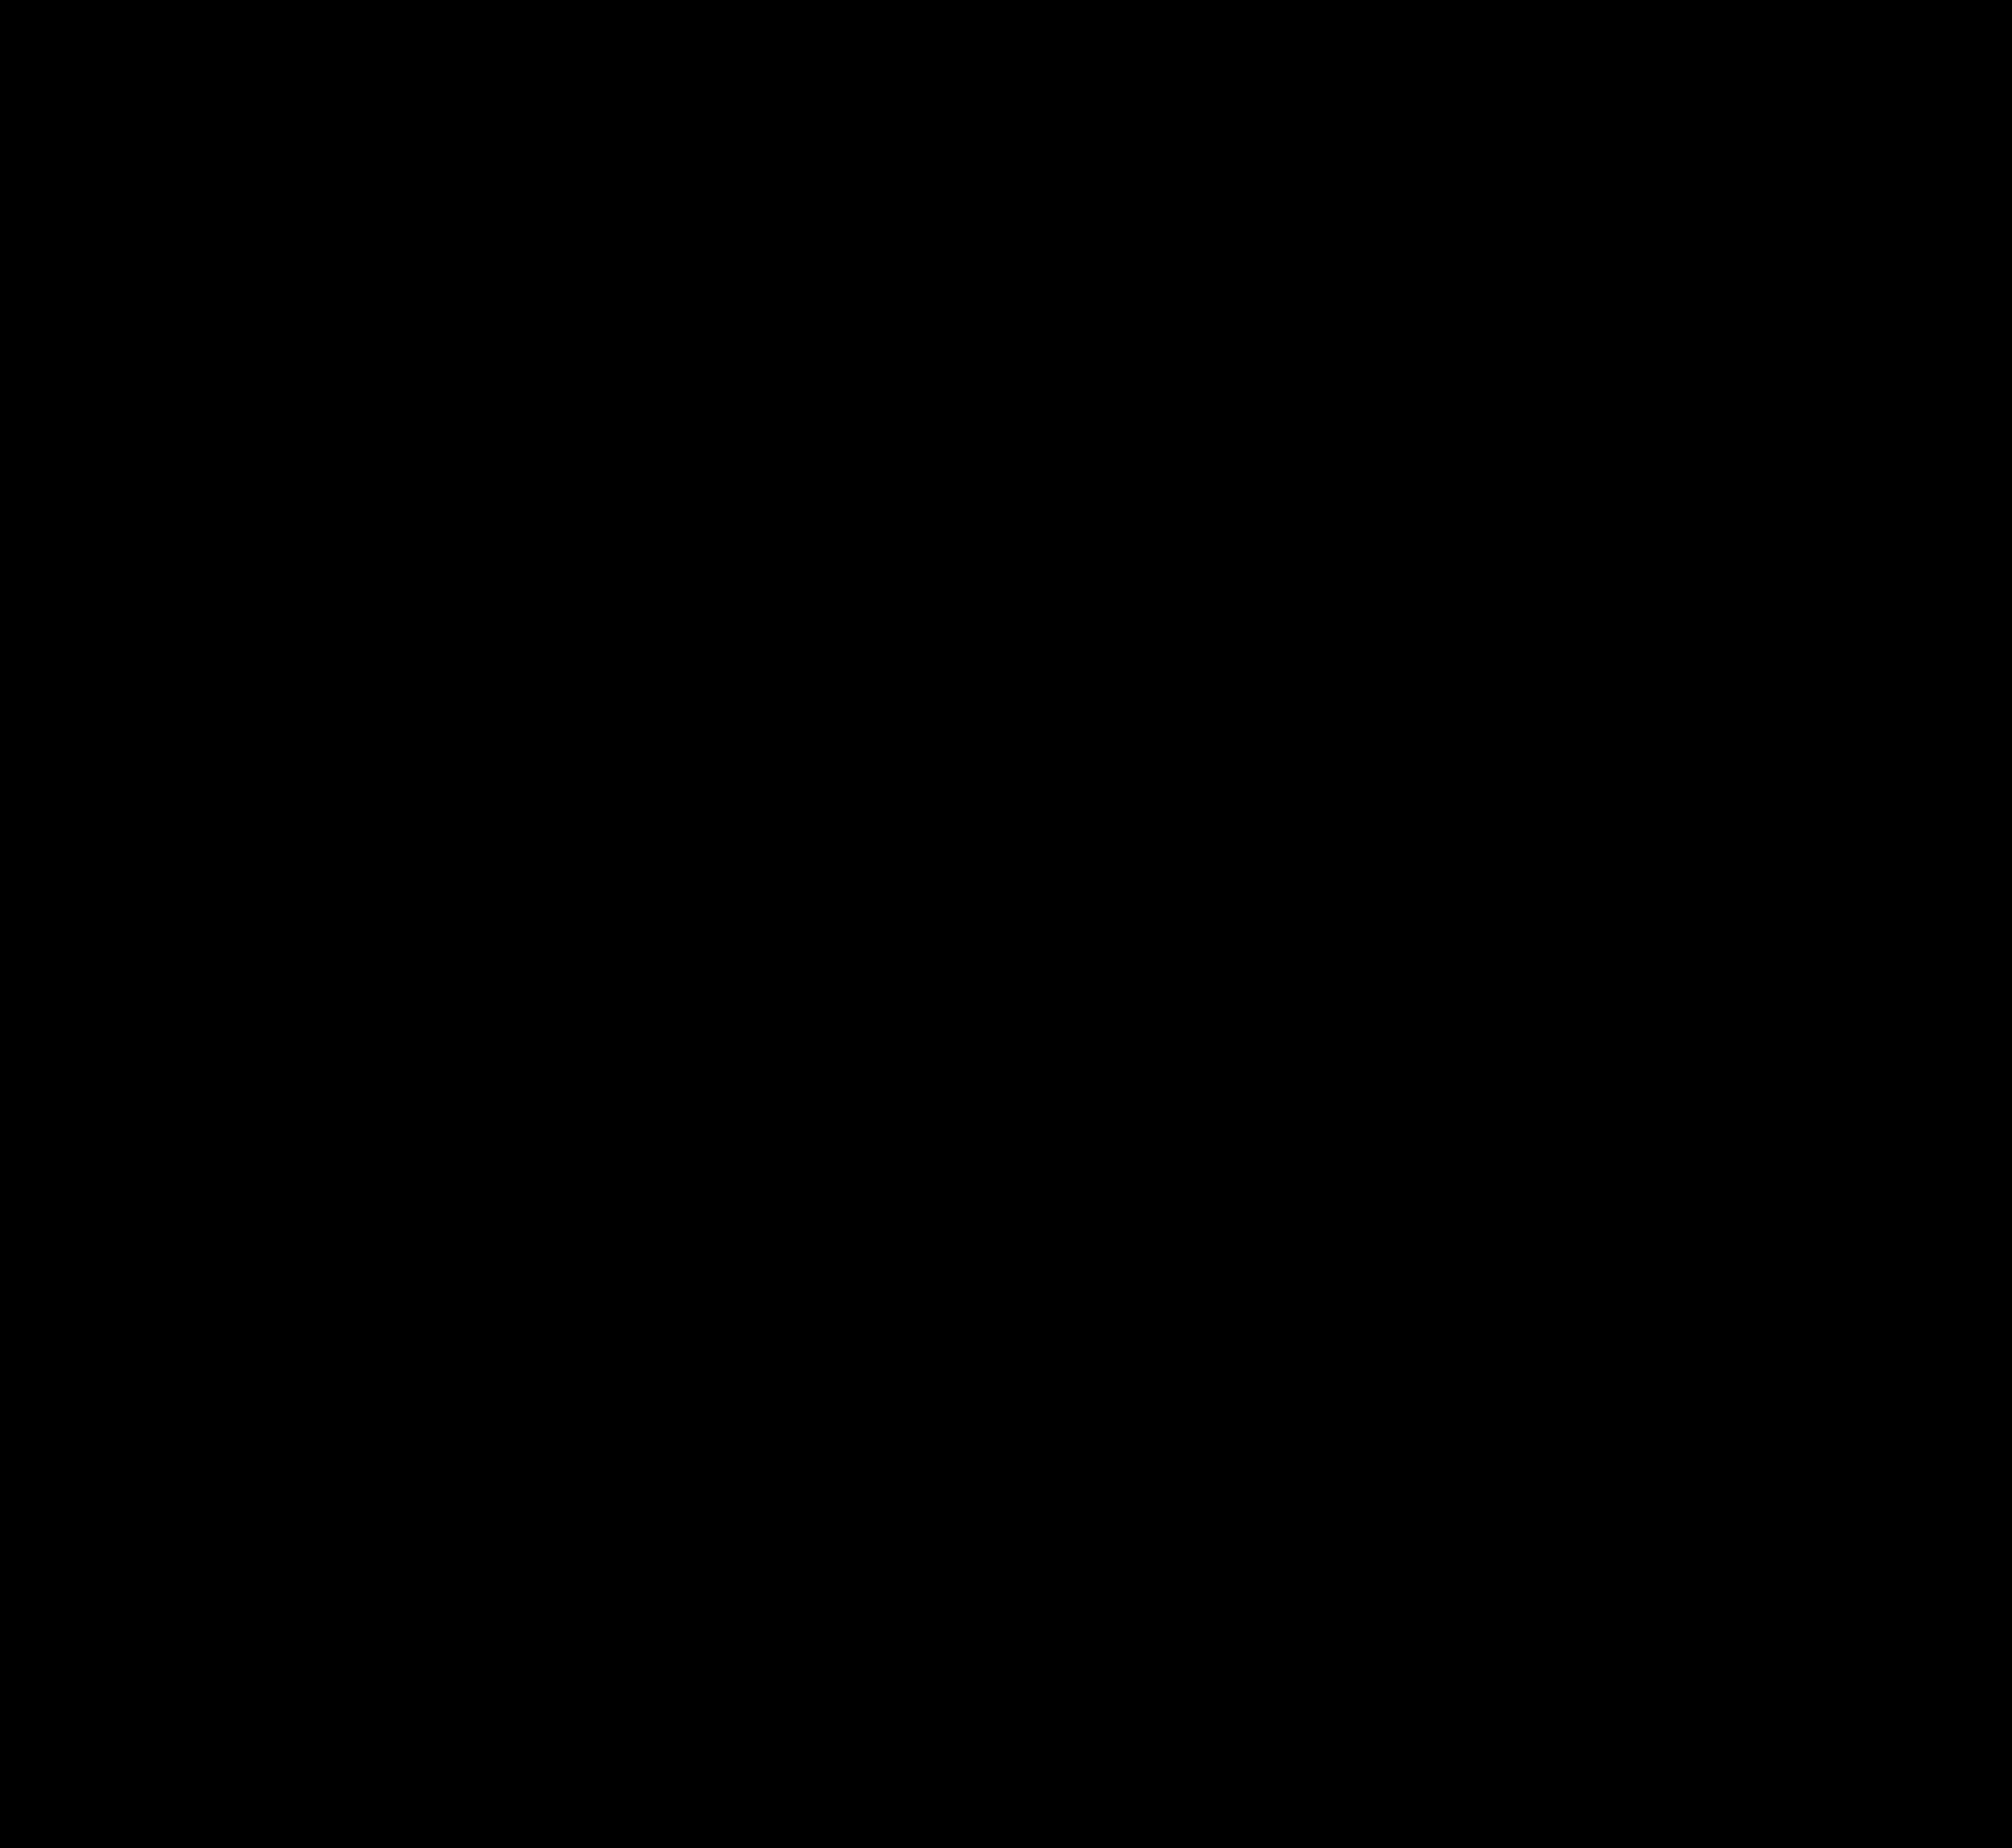 Sea star clipart black and white.